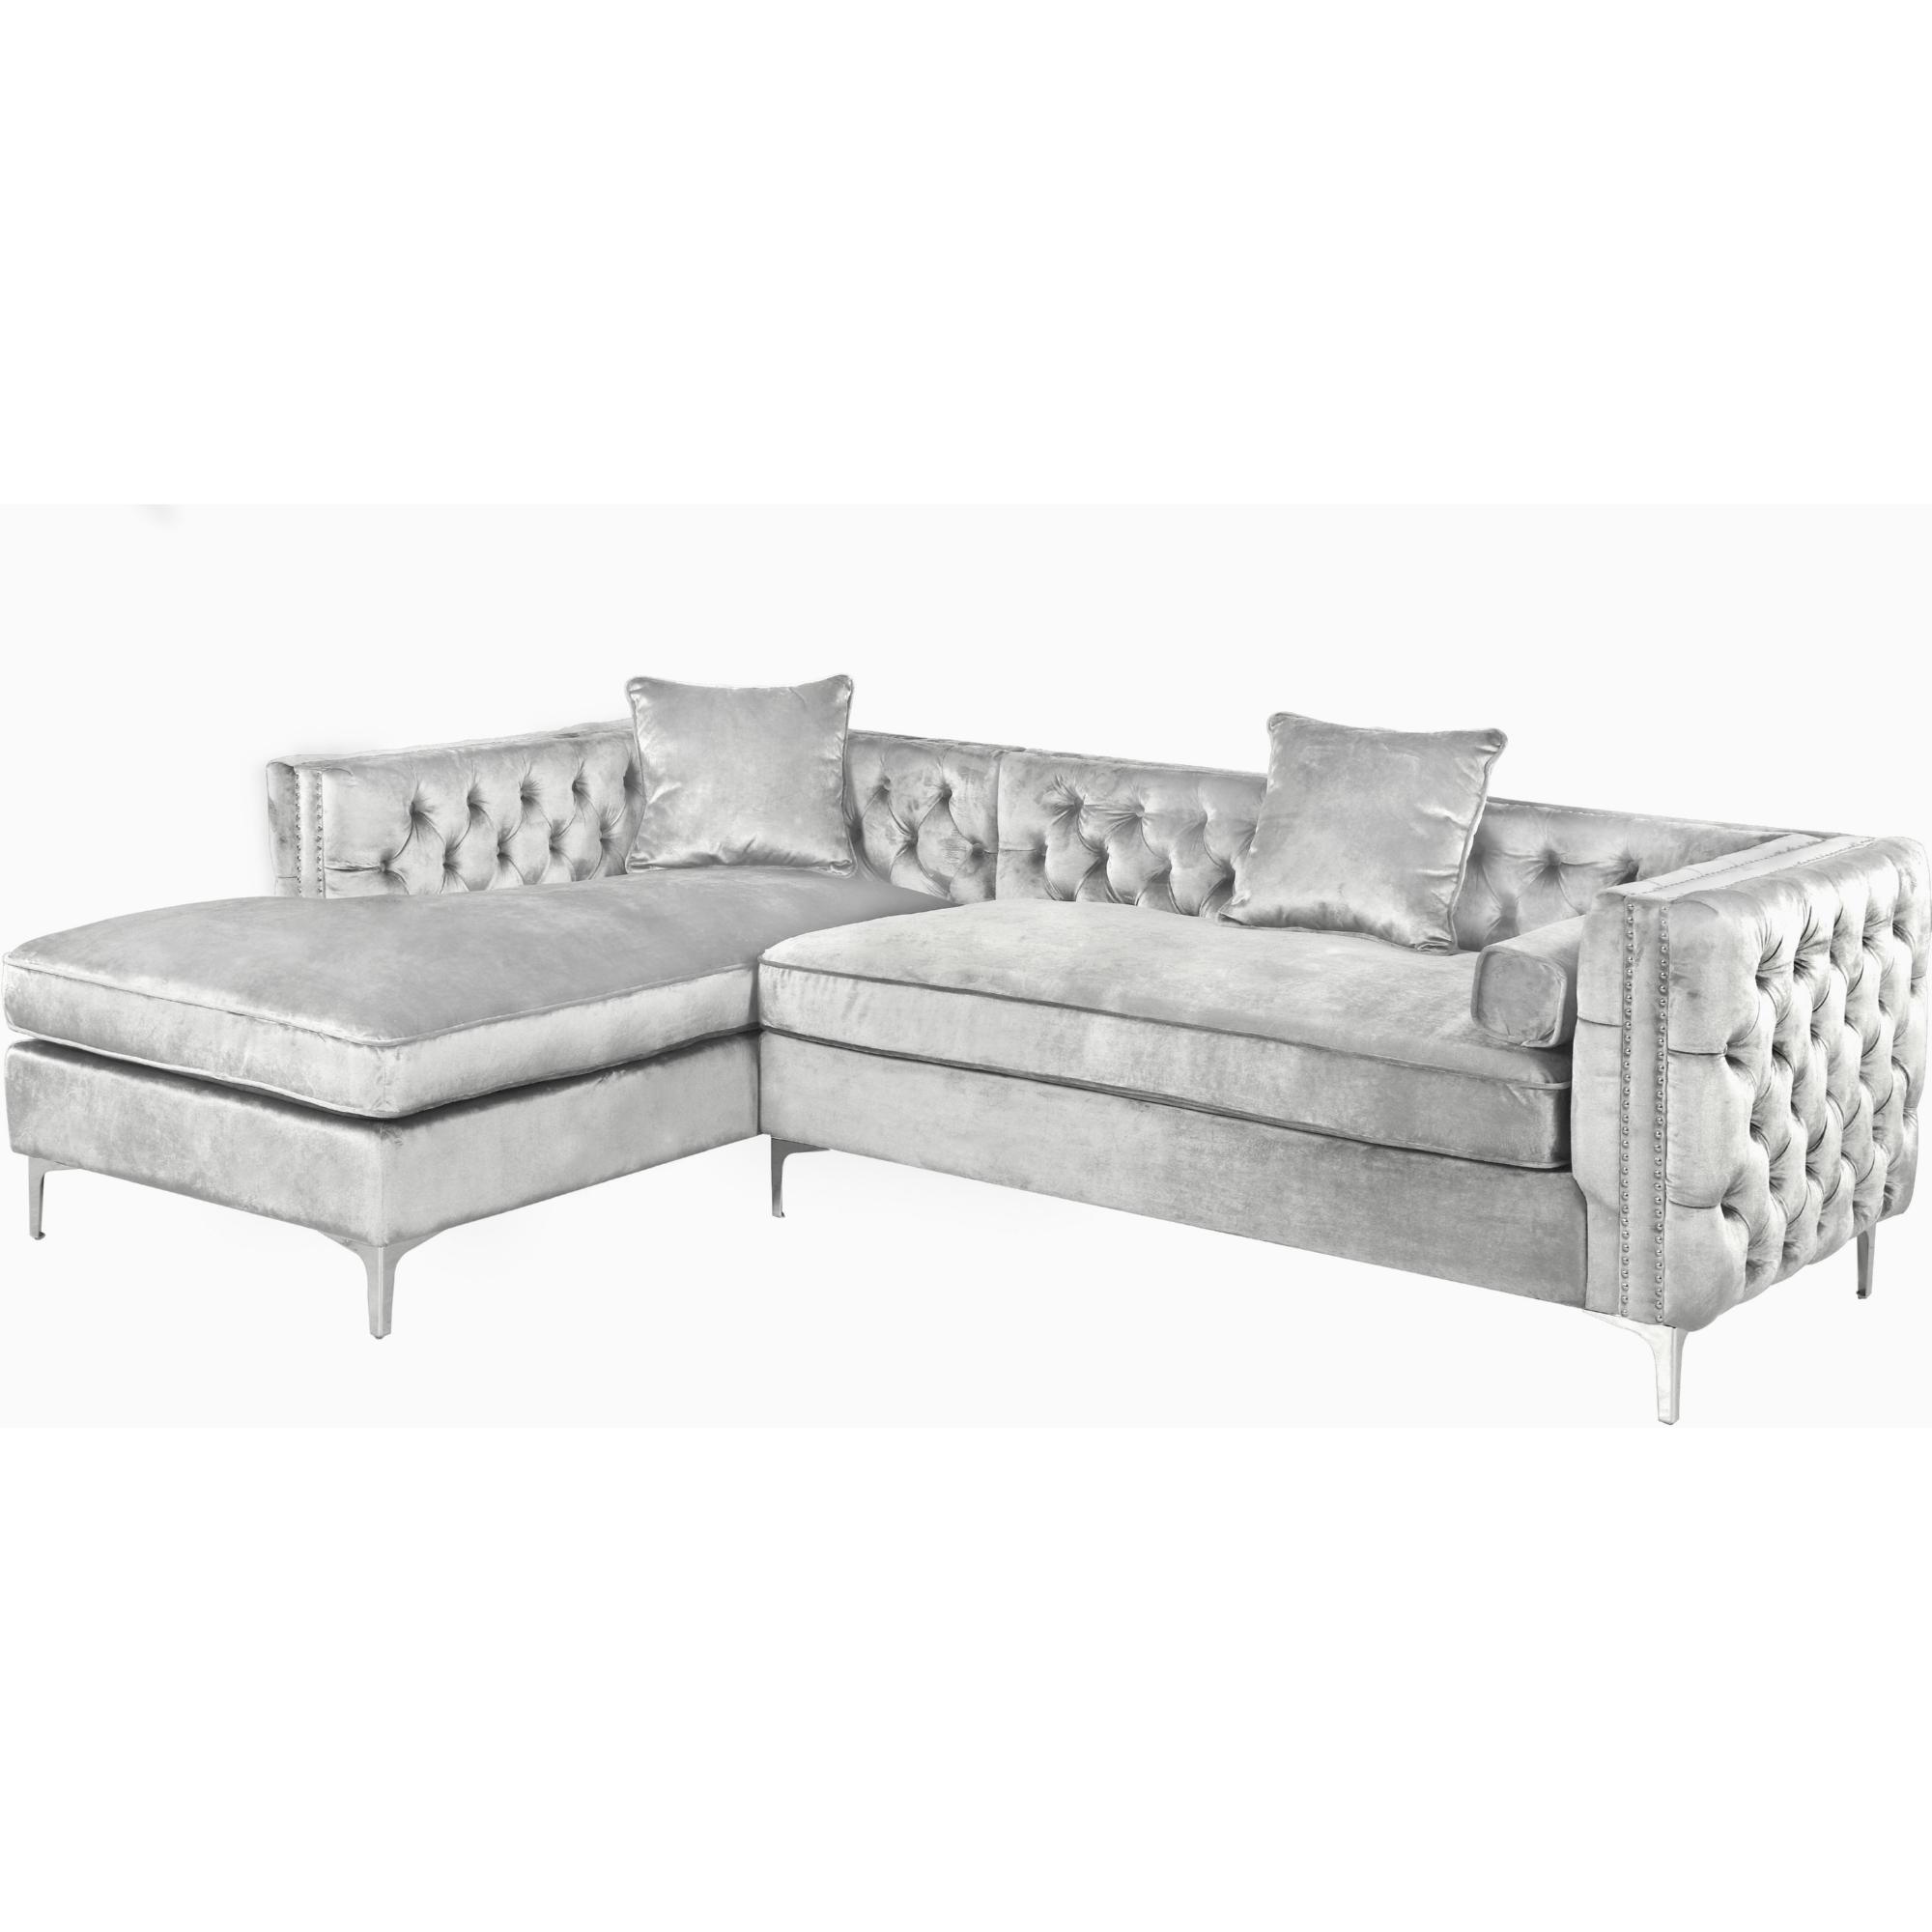 Da Vinci Sectional Sofa W/ Left Hand Chaise In Tufted Silver Velvet